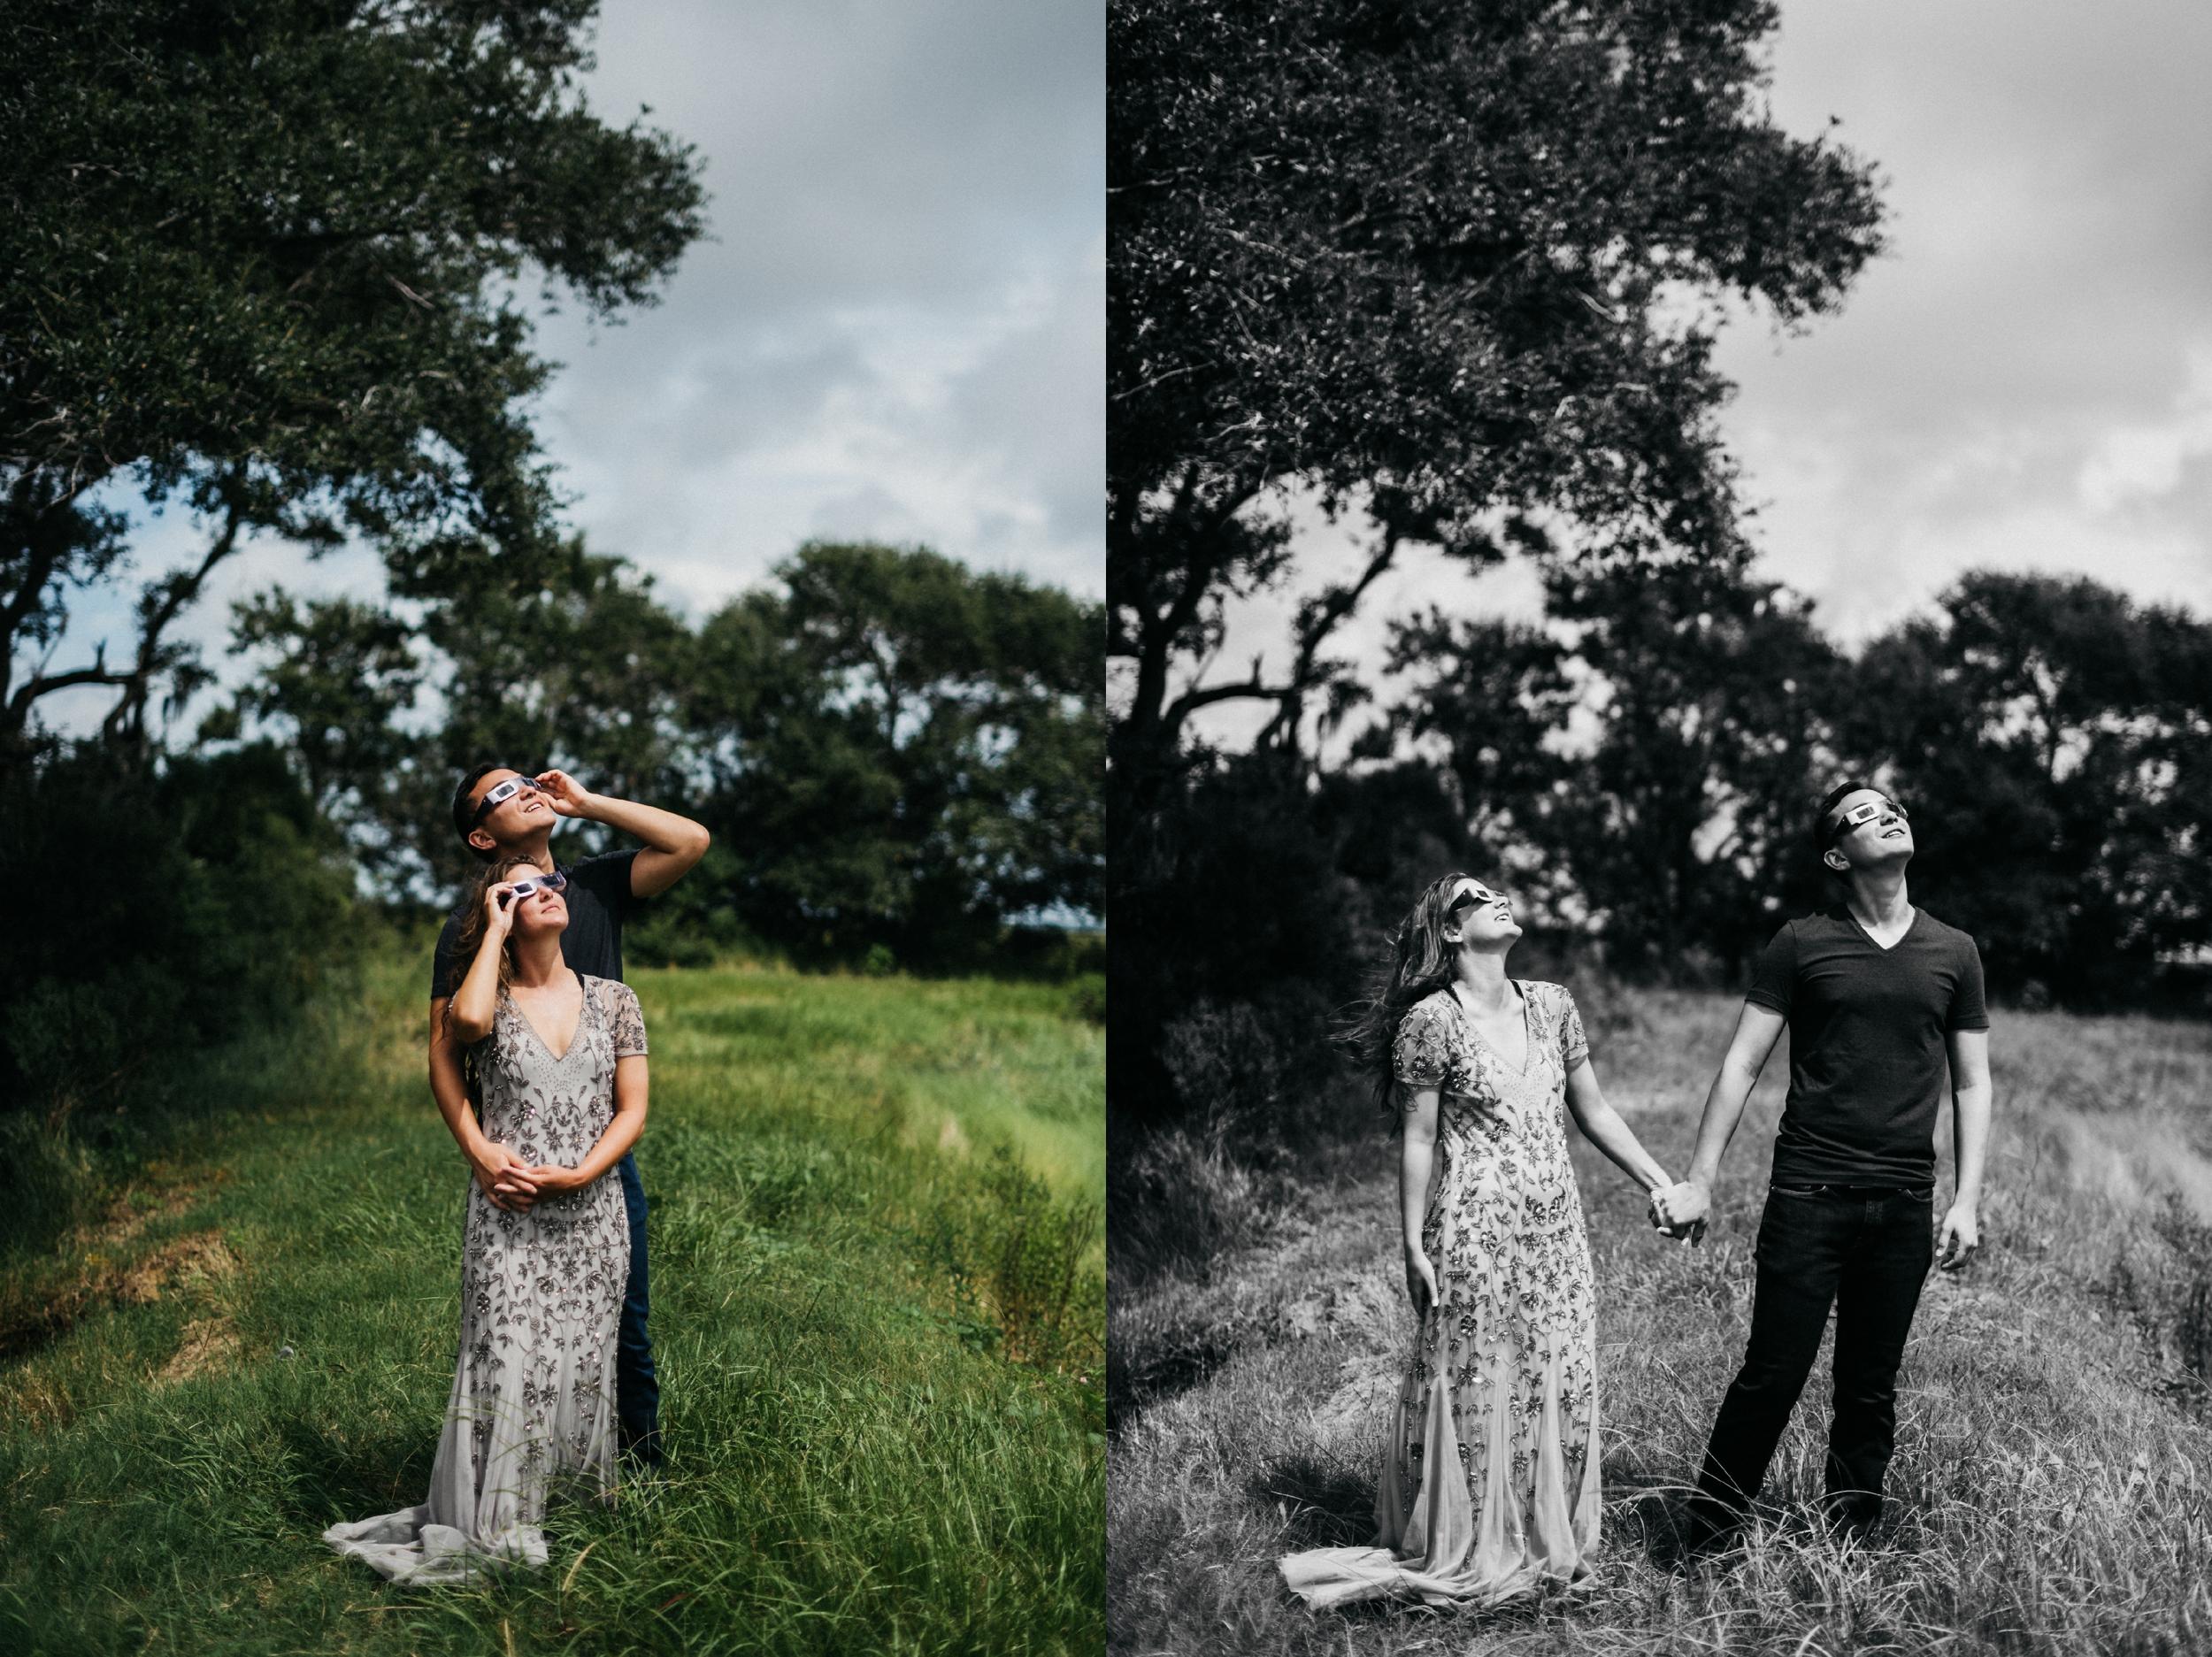 desiree-gardner-photography-pairs-france-monet-garden-monets-couple-wedding-engagement-giverny-30-a-30a-florida_0046.jpg